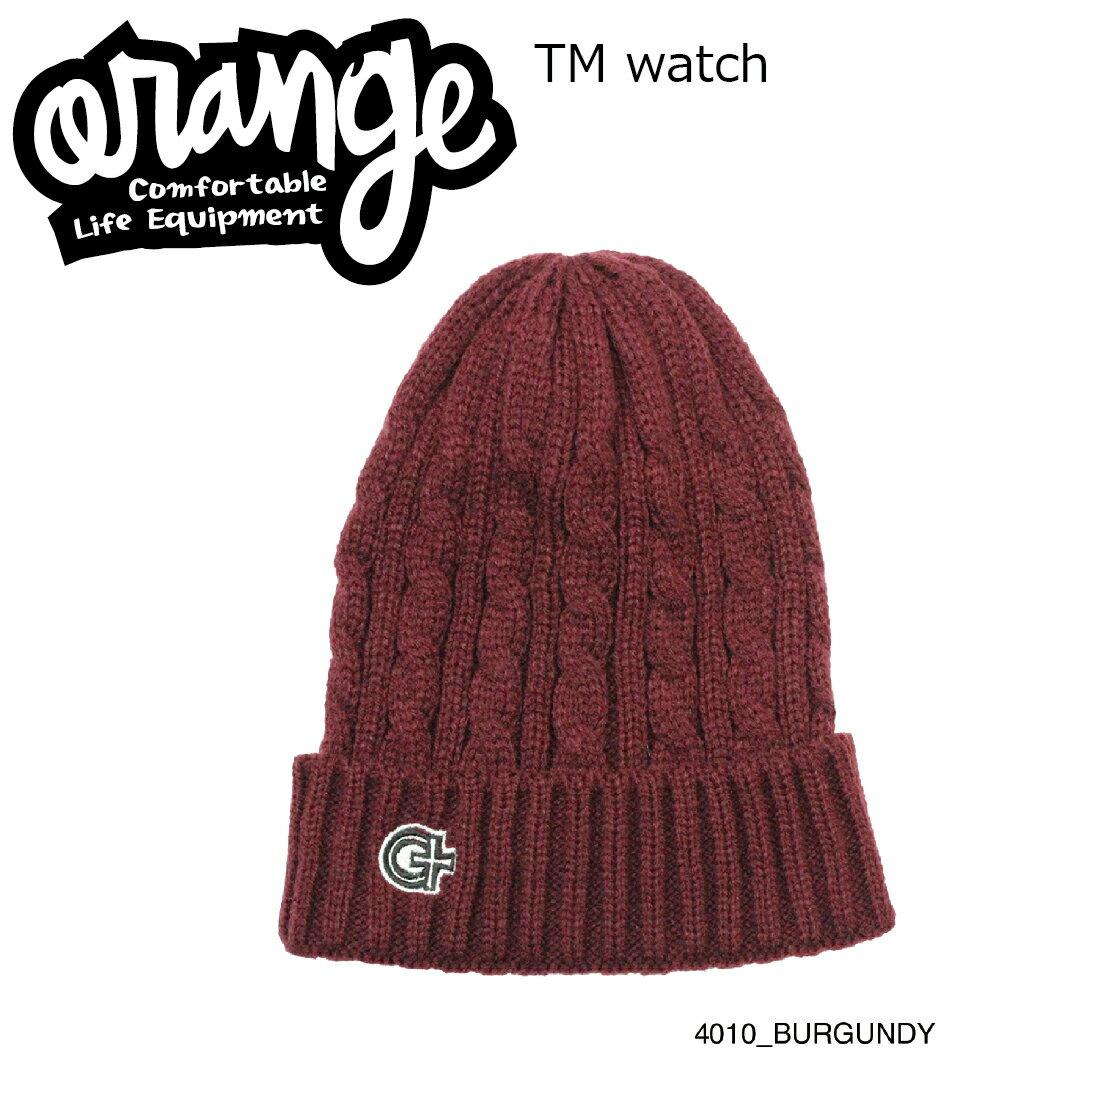 Oran'ge Tm Watch Cap Beanie 4010 BURGUNDY オレンジ ティーエム ワッチ キャップ ビーニー ニットキャップ 2つ折り